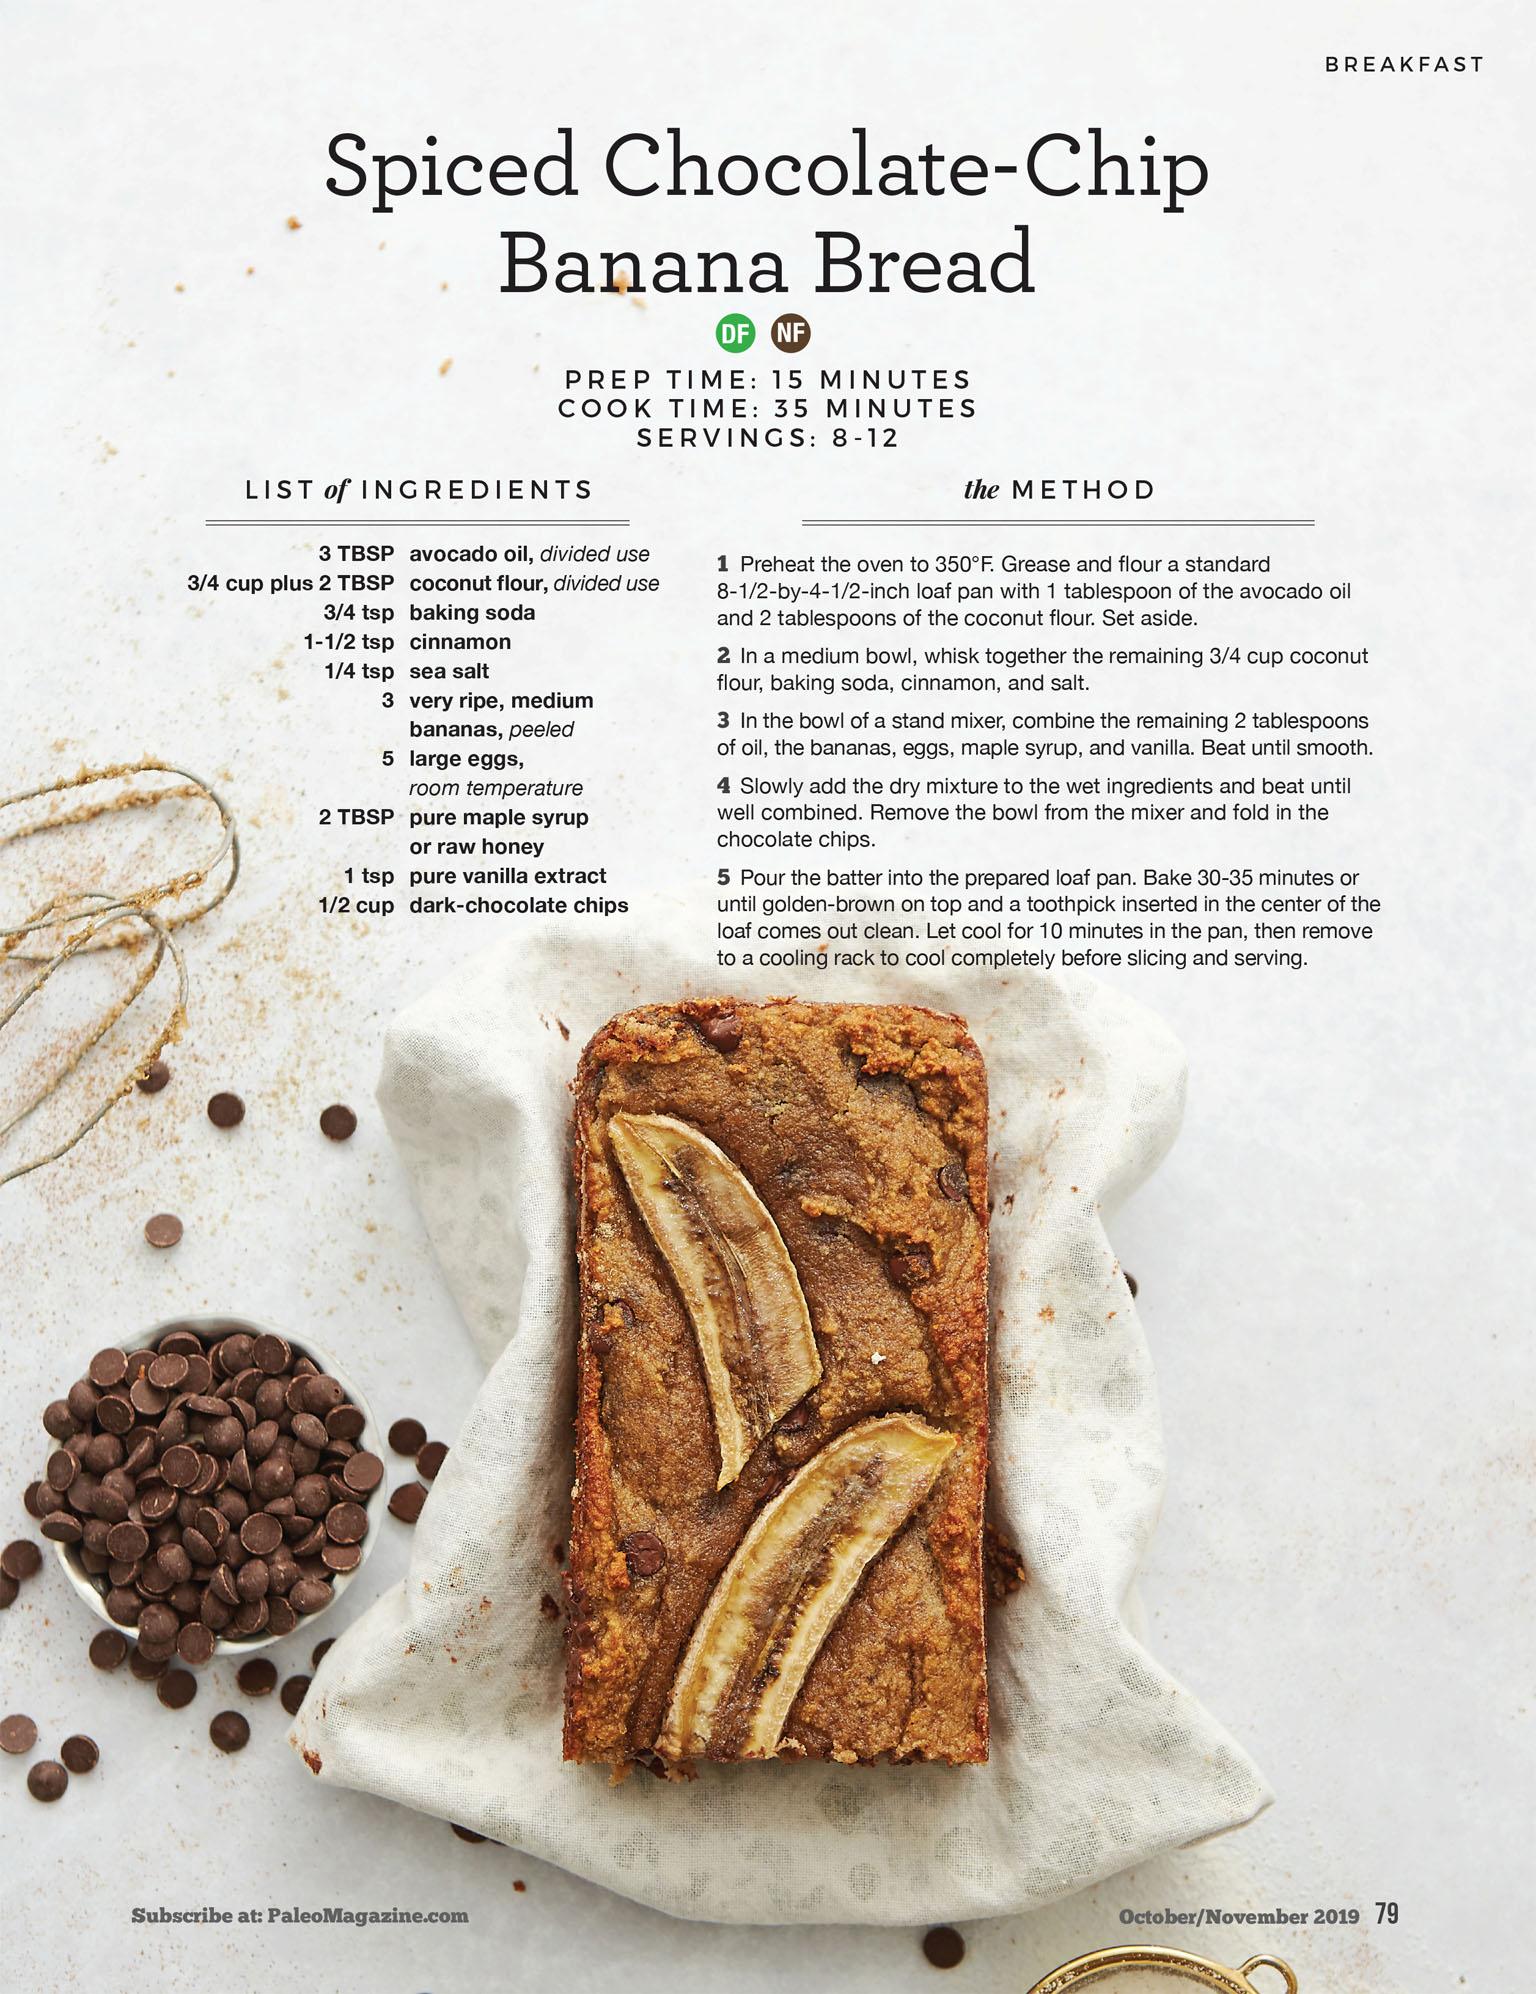 Paleo Magazine - Spiced Chocolate Chip Banana Bread Recipe